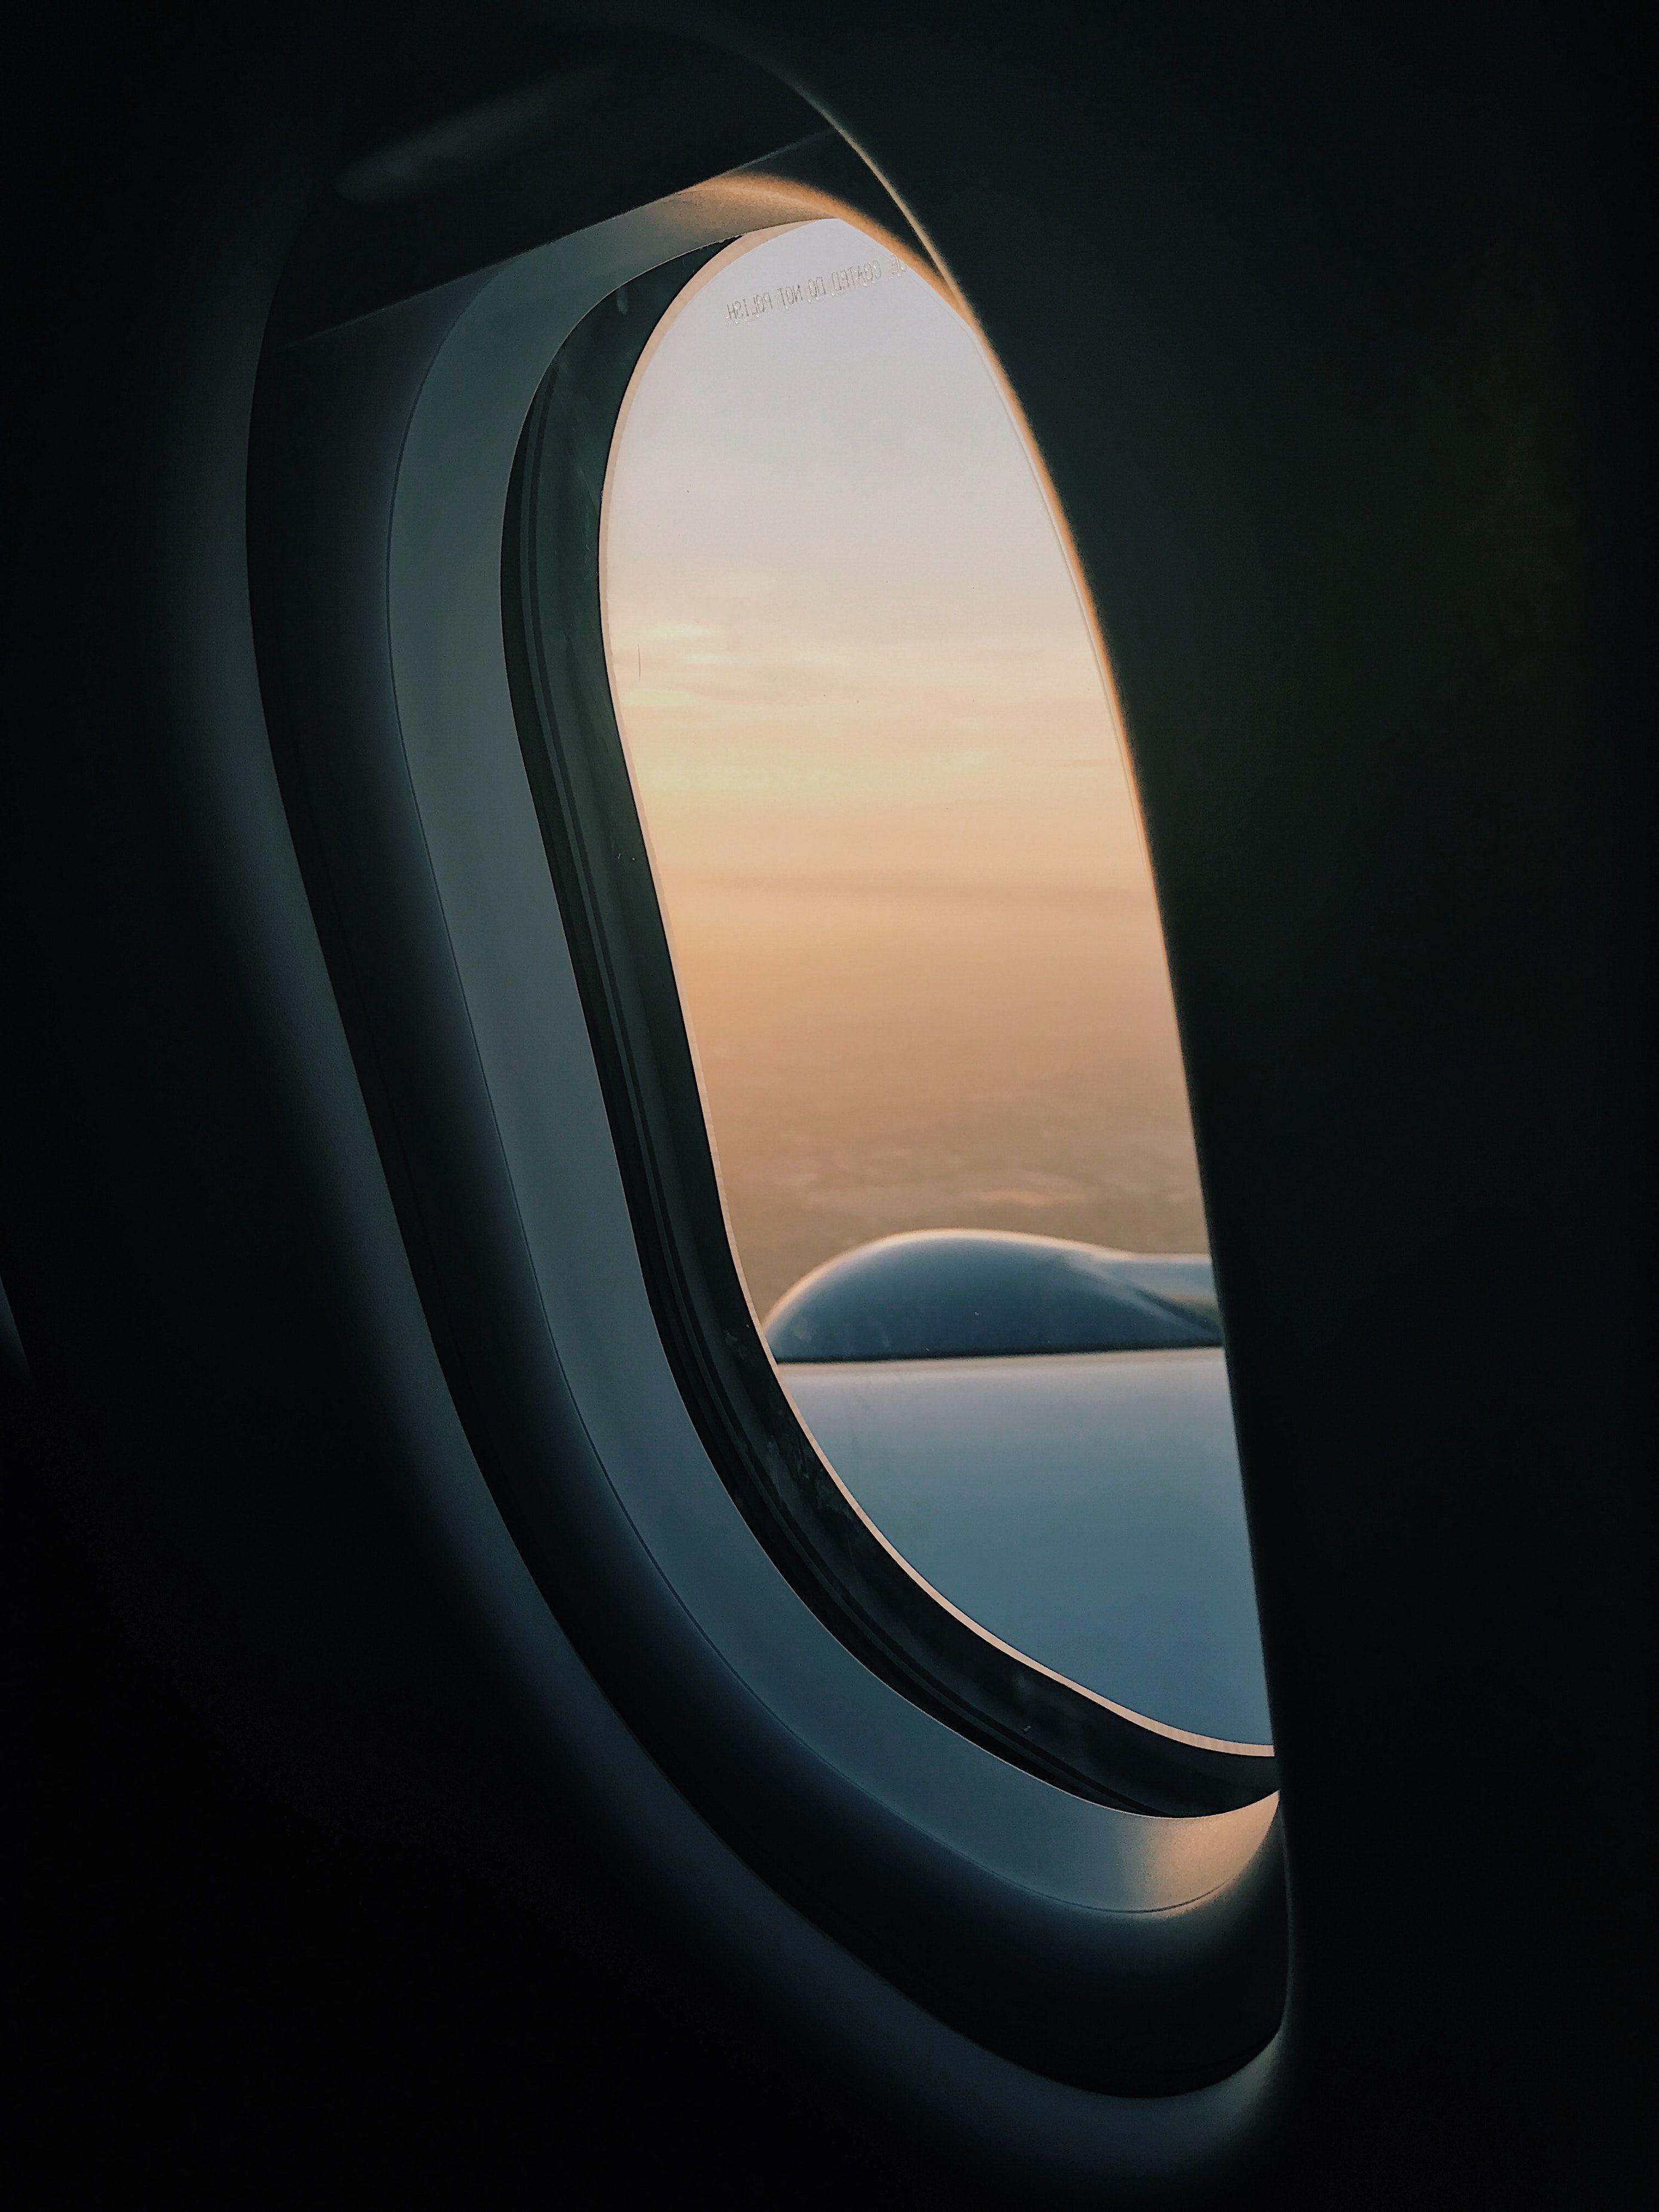 Airplane Window Plane Window Wallpaper Iphone Wallpapers